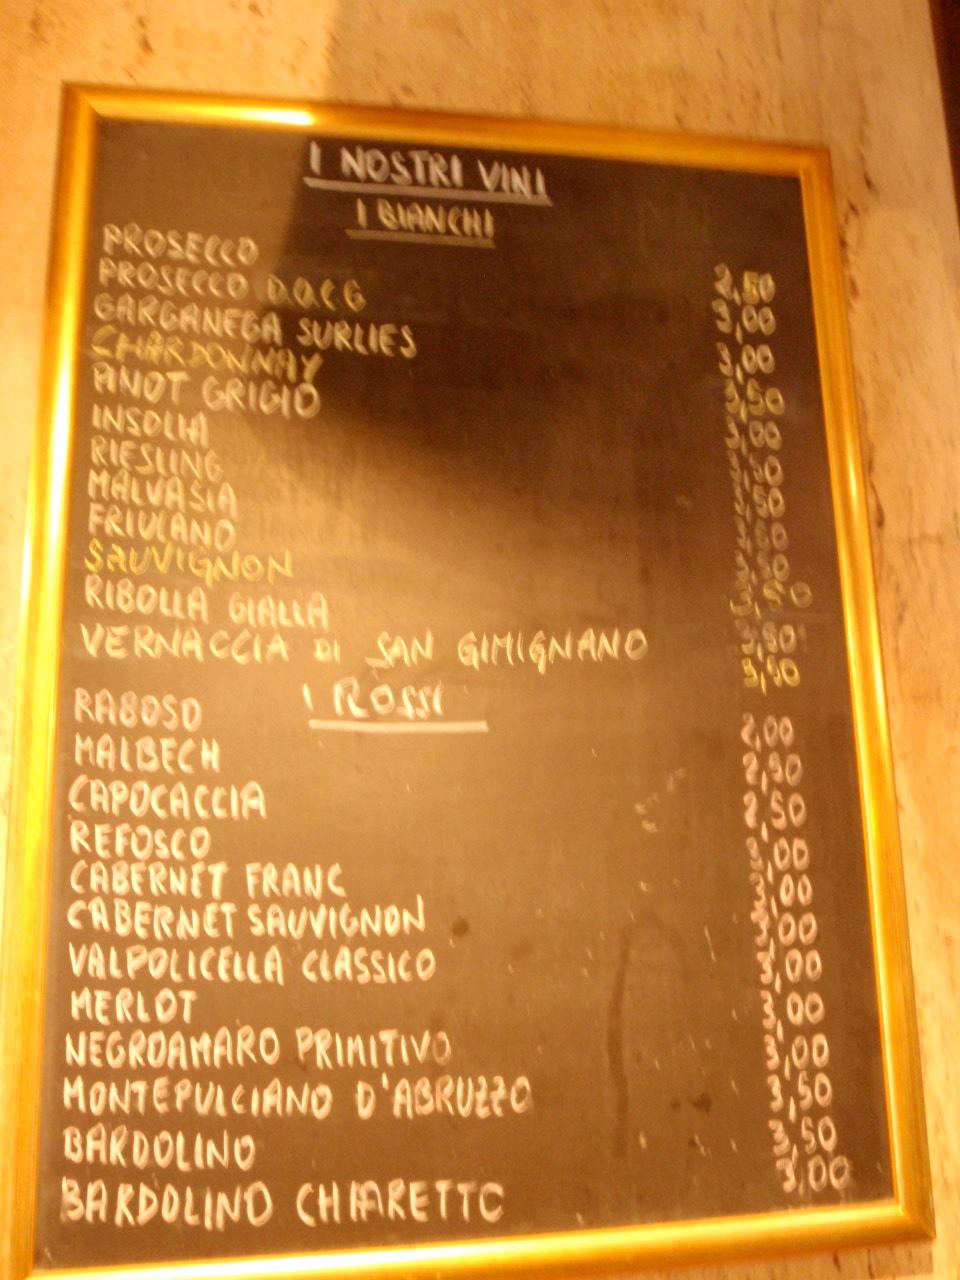 wine list w/ prices